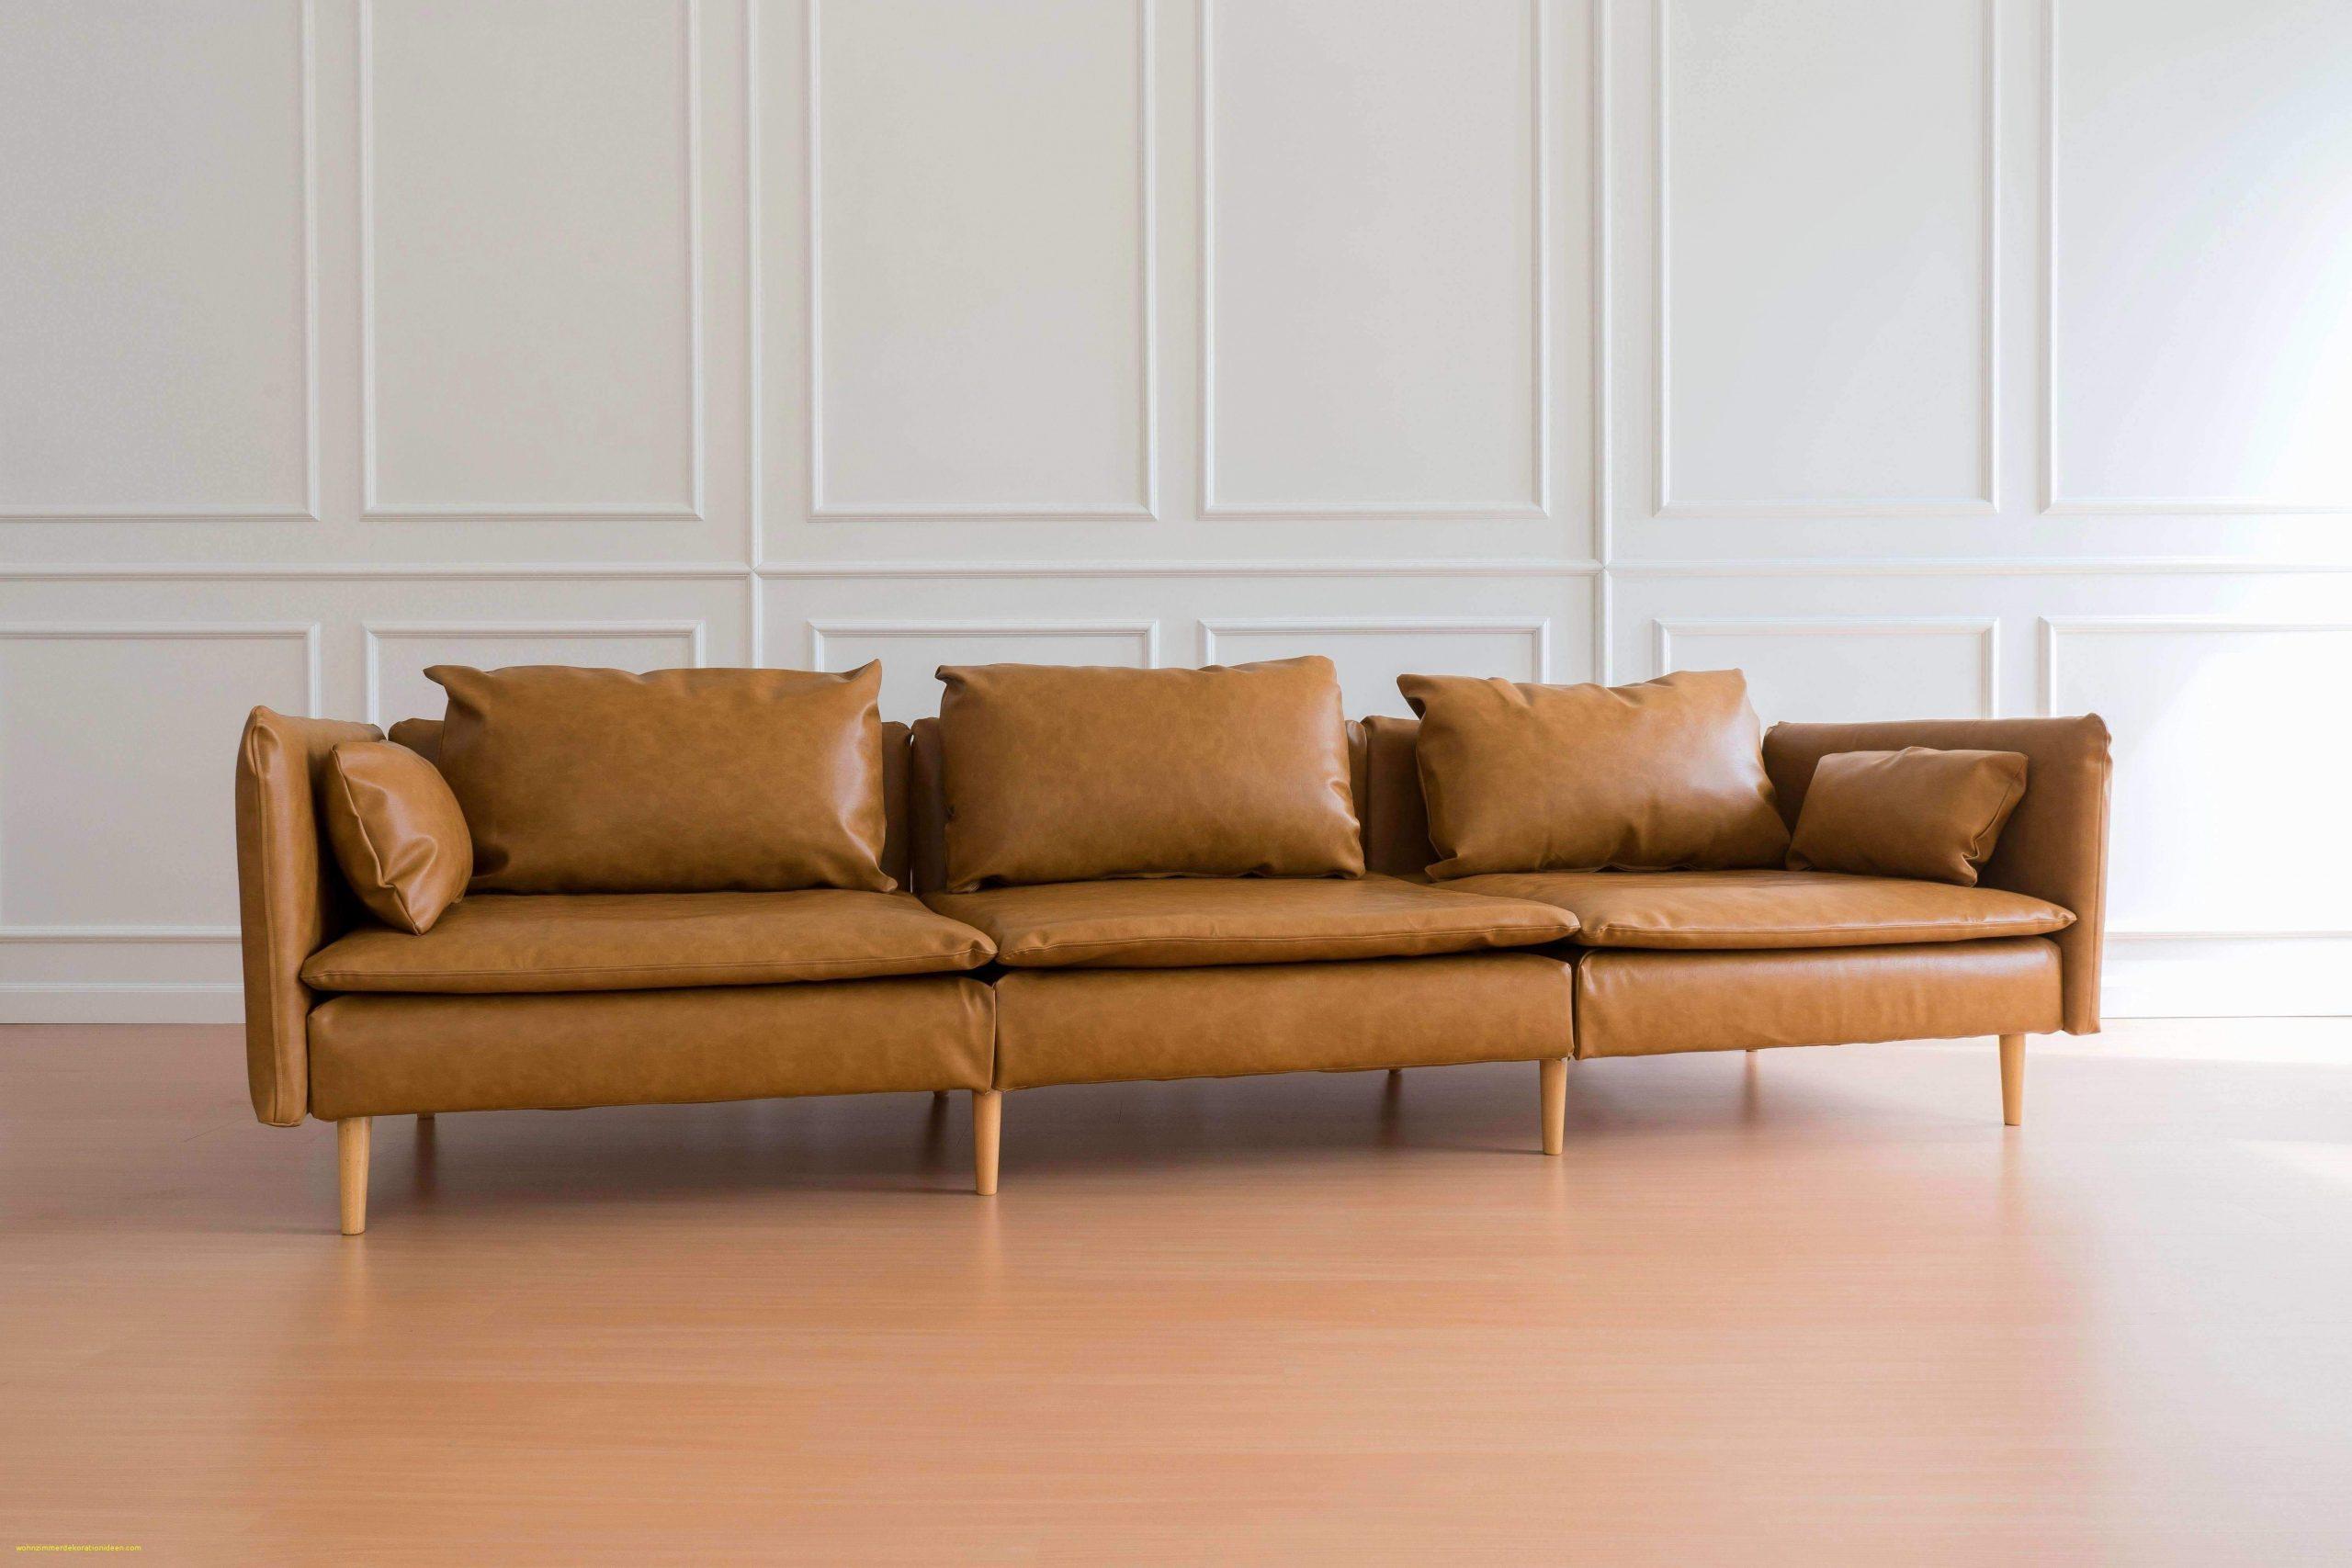 Full Size of Wohnzimmer Sessel Genial 50 Einzigartig Von Wohnzimmer Sessel Modern Meinung Wohnzimmer Wohnzimmer Sessel